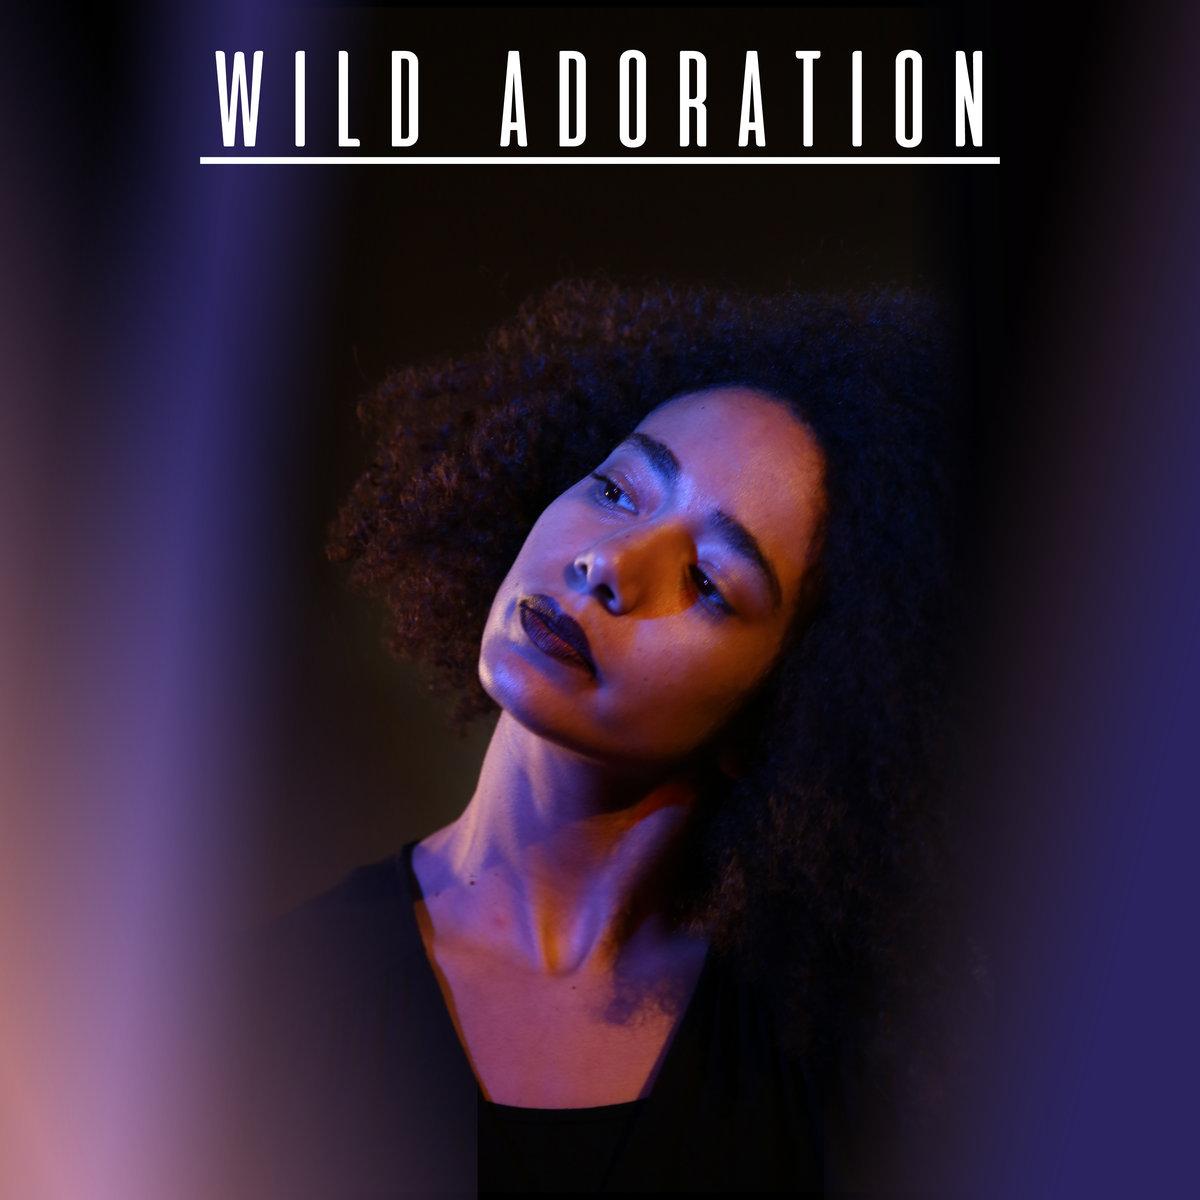 Wild Adoration  - Wild Adoration